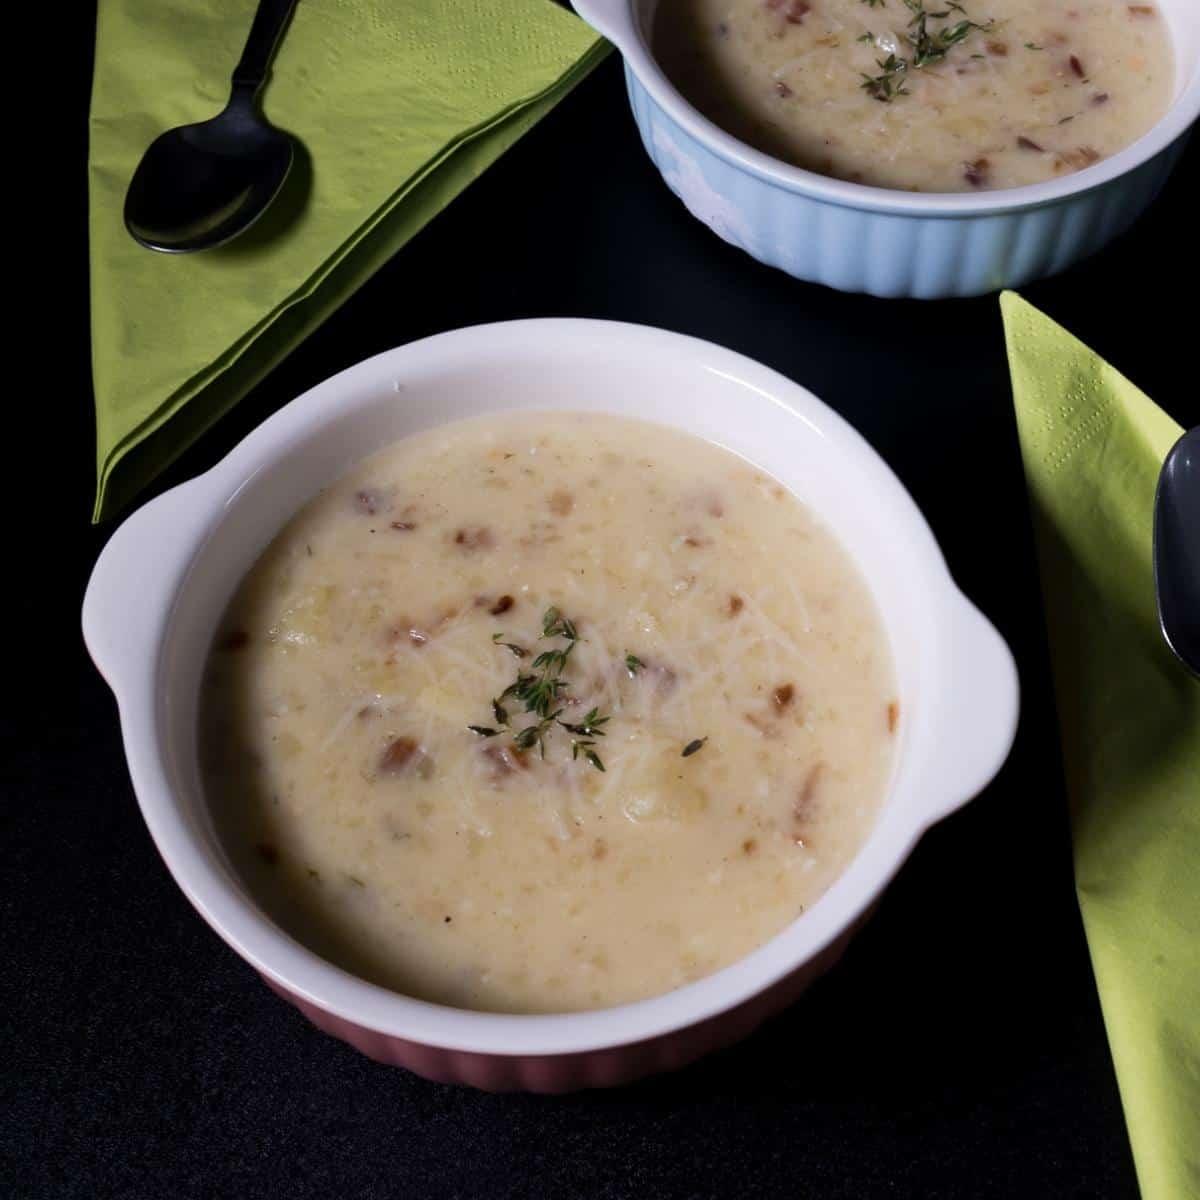 A bowl of potato soup.